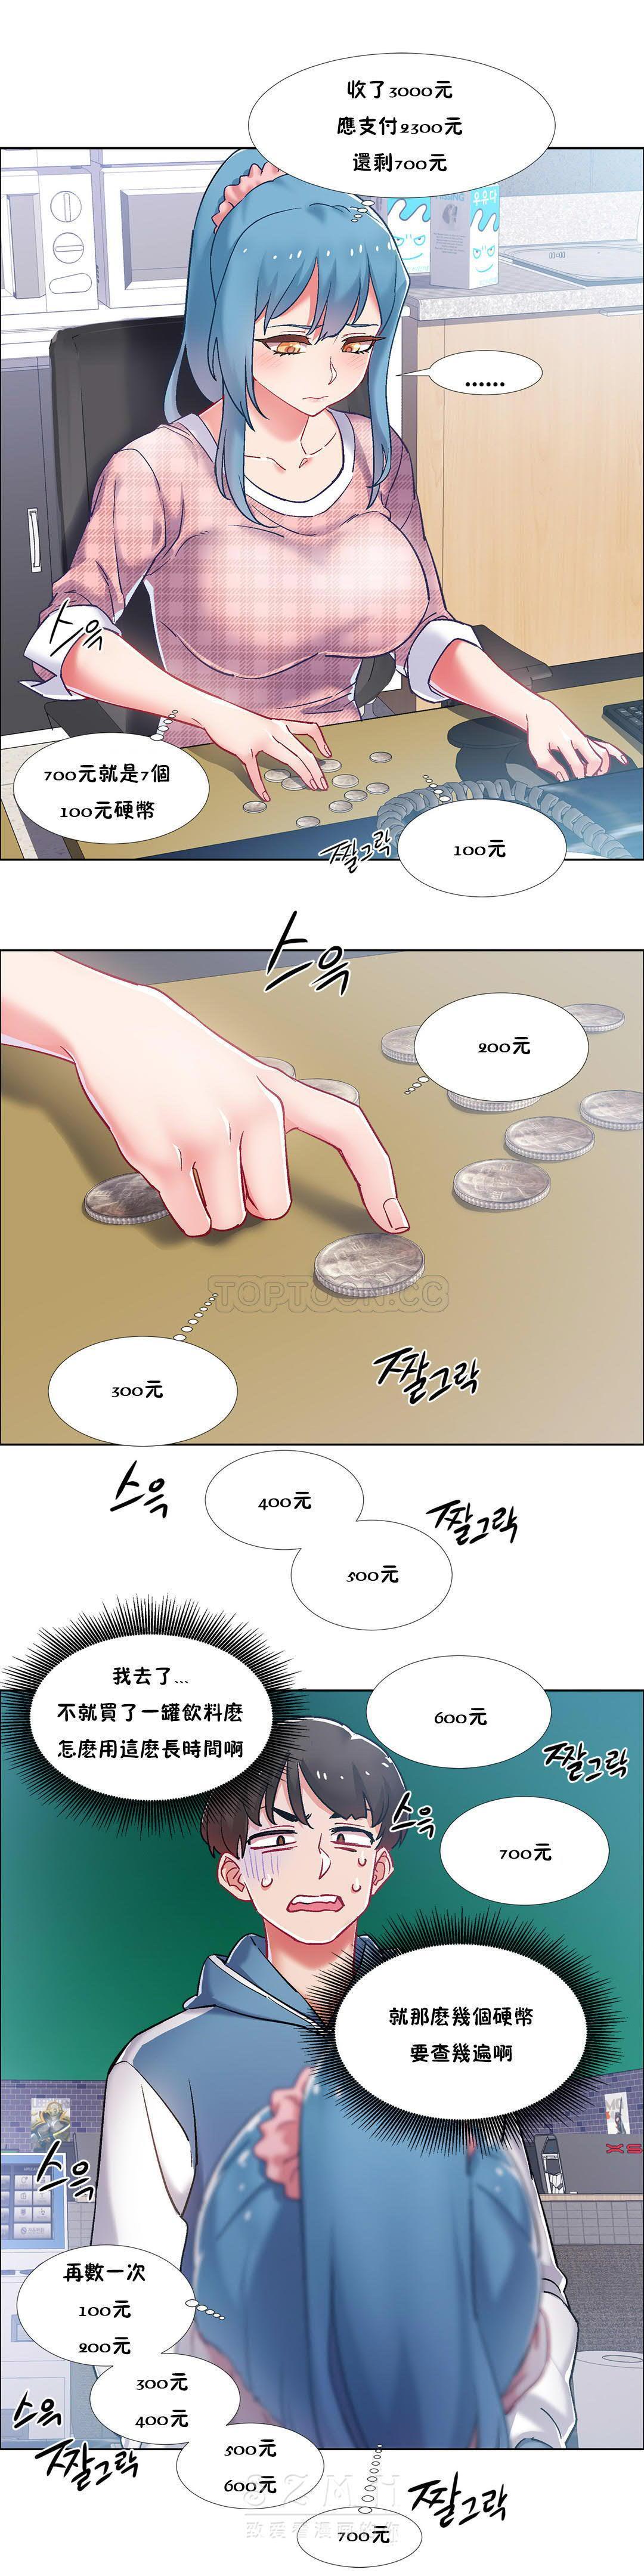 [Studio Wannabe] Rental Girls | 出租女郎 Ch. 33-58 [Chinese]  第二季 完结 39